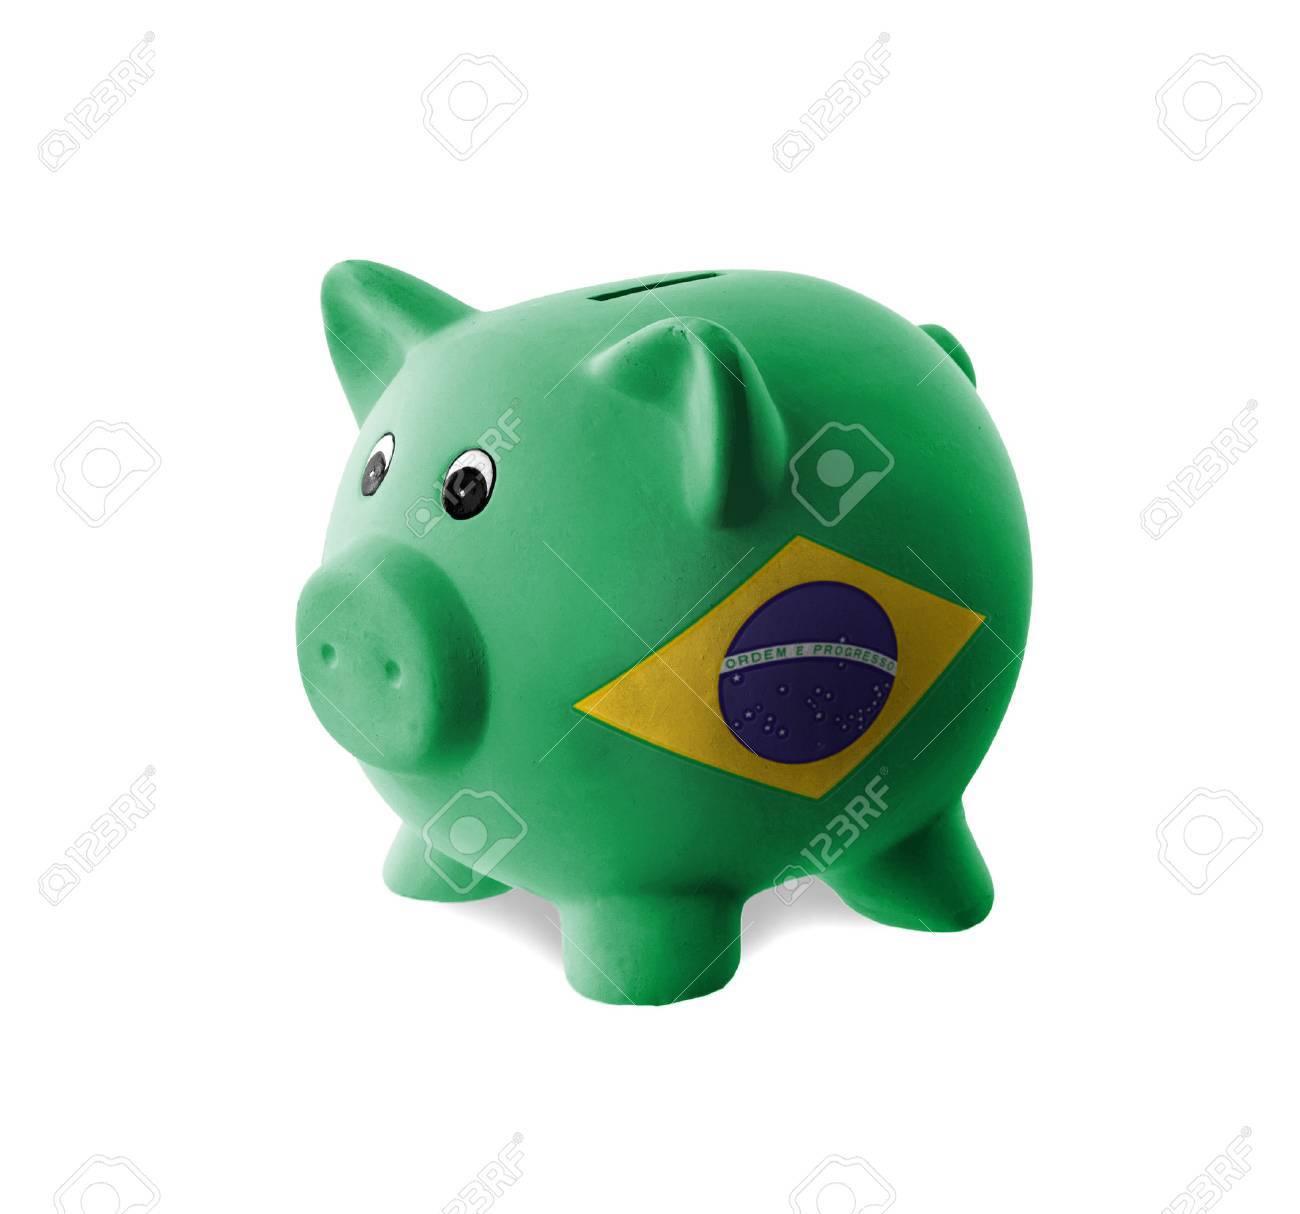 Handmade watercolor brazil flag brasil stock photos freeimages com - Brazilia Ceramic Piggy Bank With Painting Of National Flag Brazil